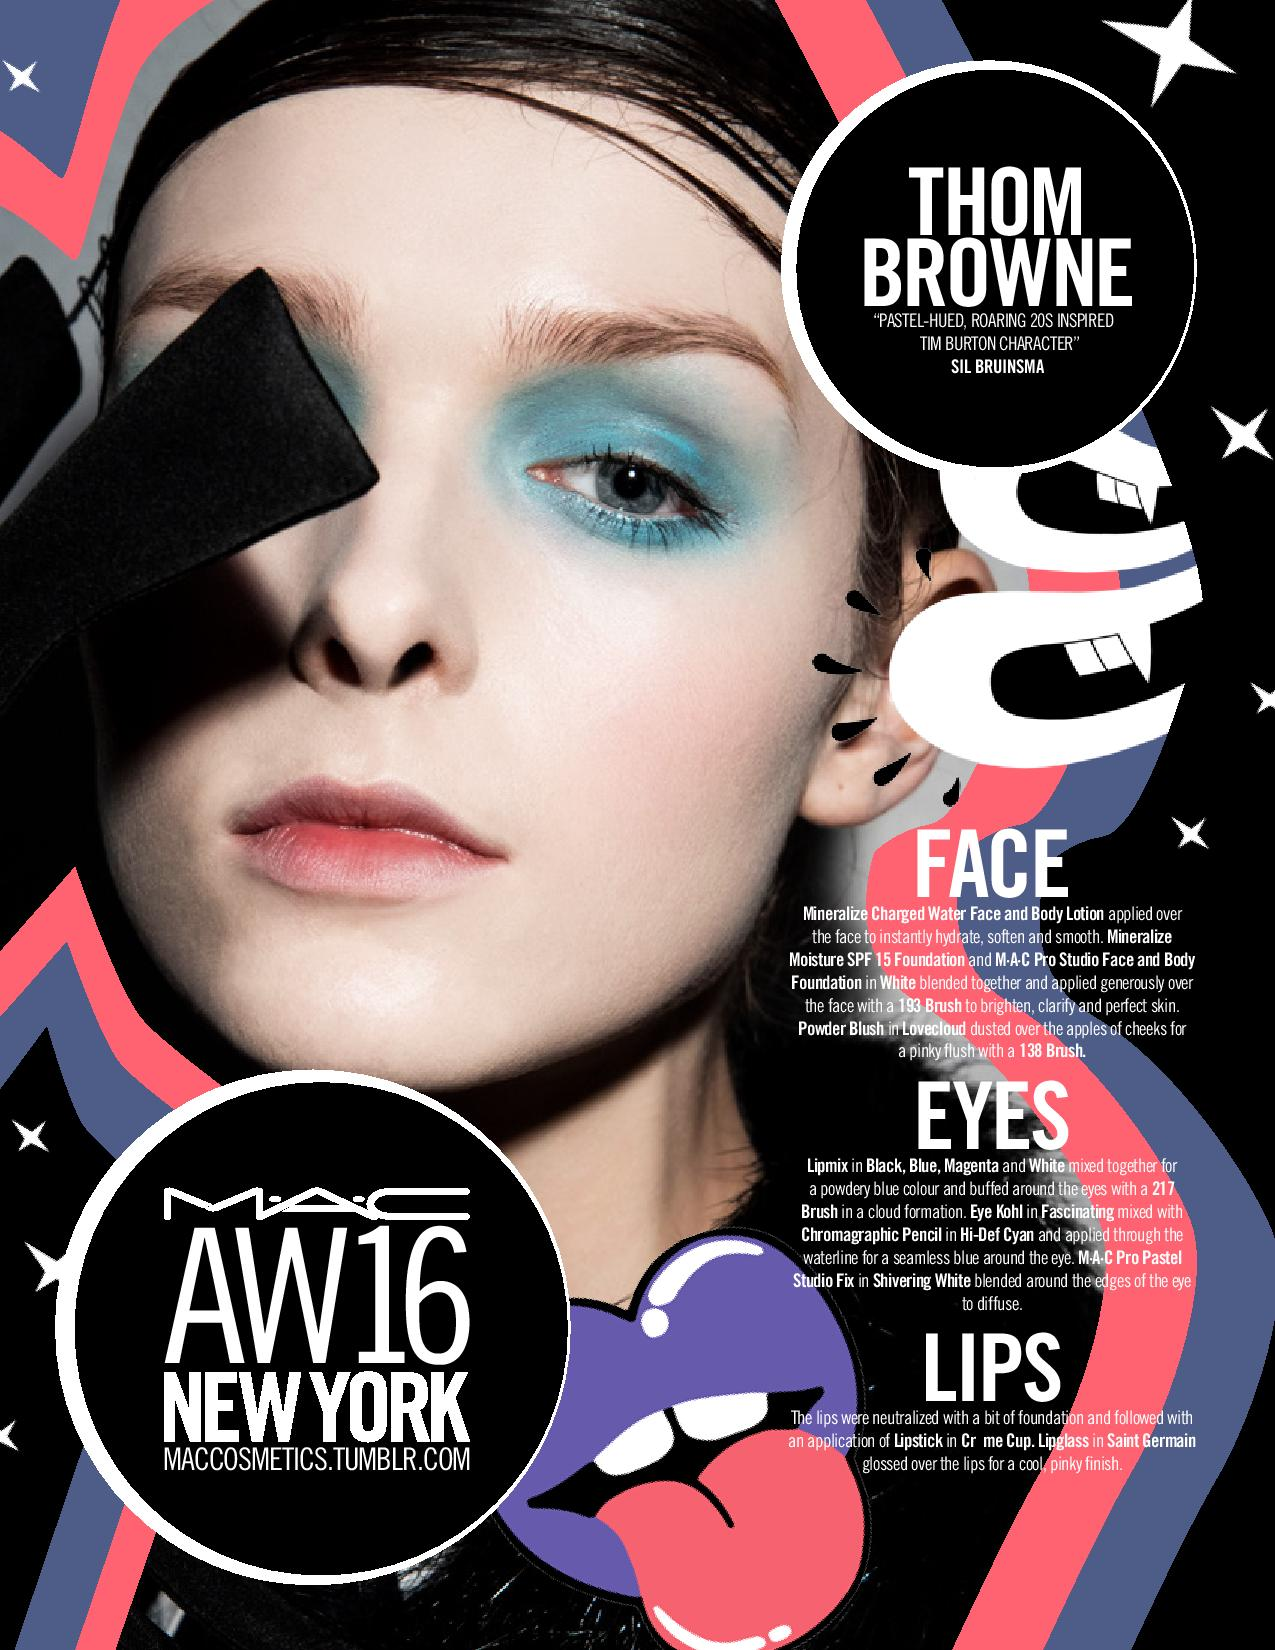 AW16_DAILY FACECHART_NEW YORK_FEB 15 Carolina Herrera, Jeremy Scott, Rag...-page-006